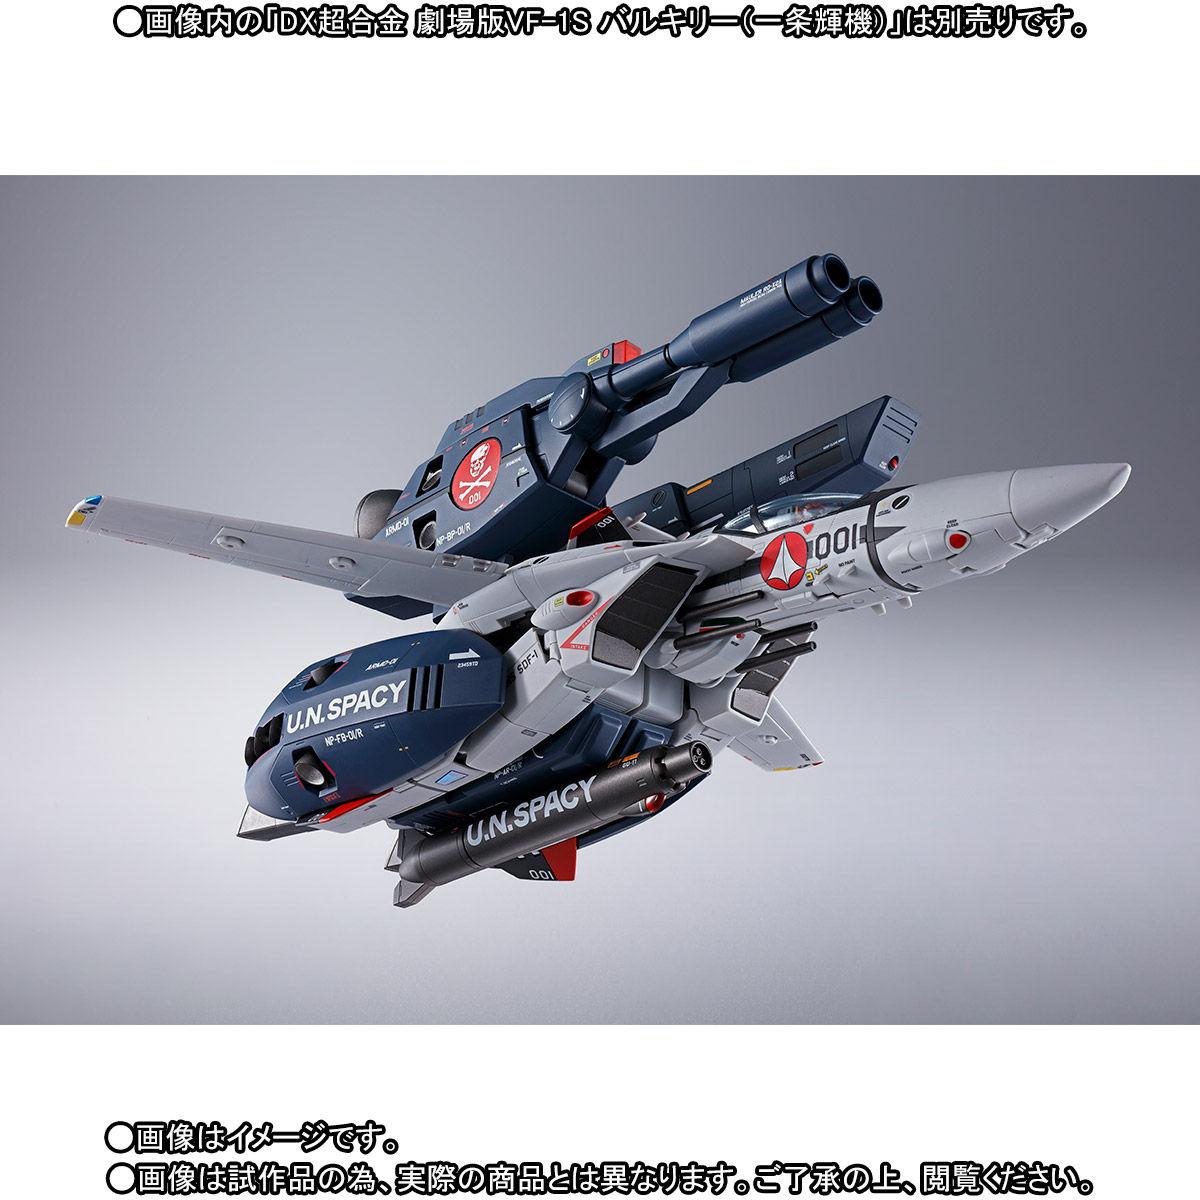 DX超合金『劇場版VF-1対応ストライク/スーパーパーツセット』拡張パーツ-004